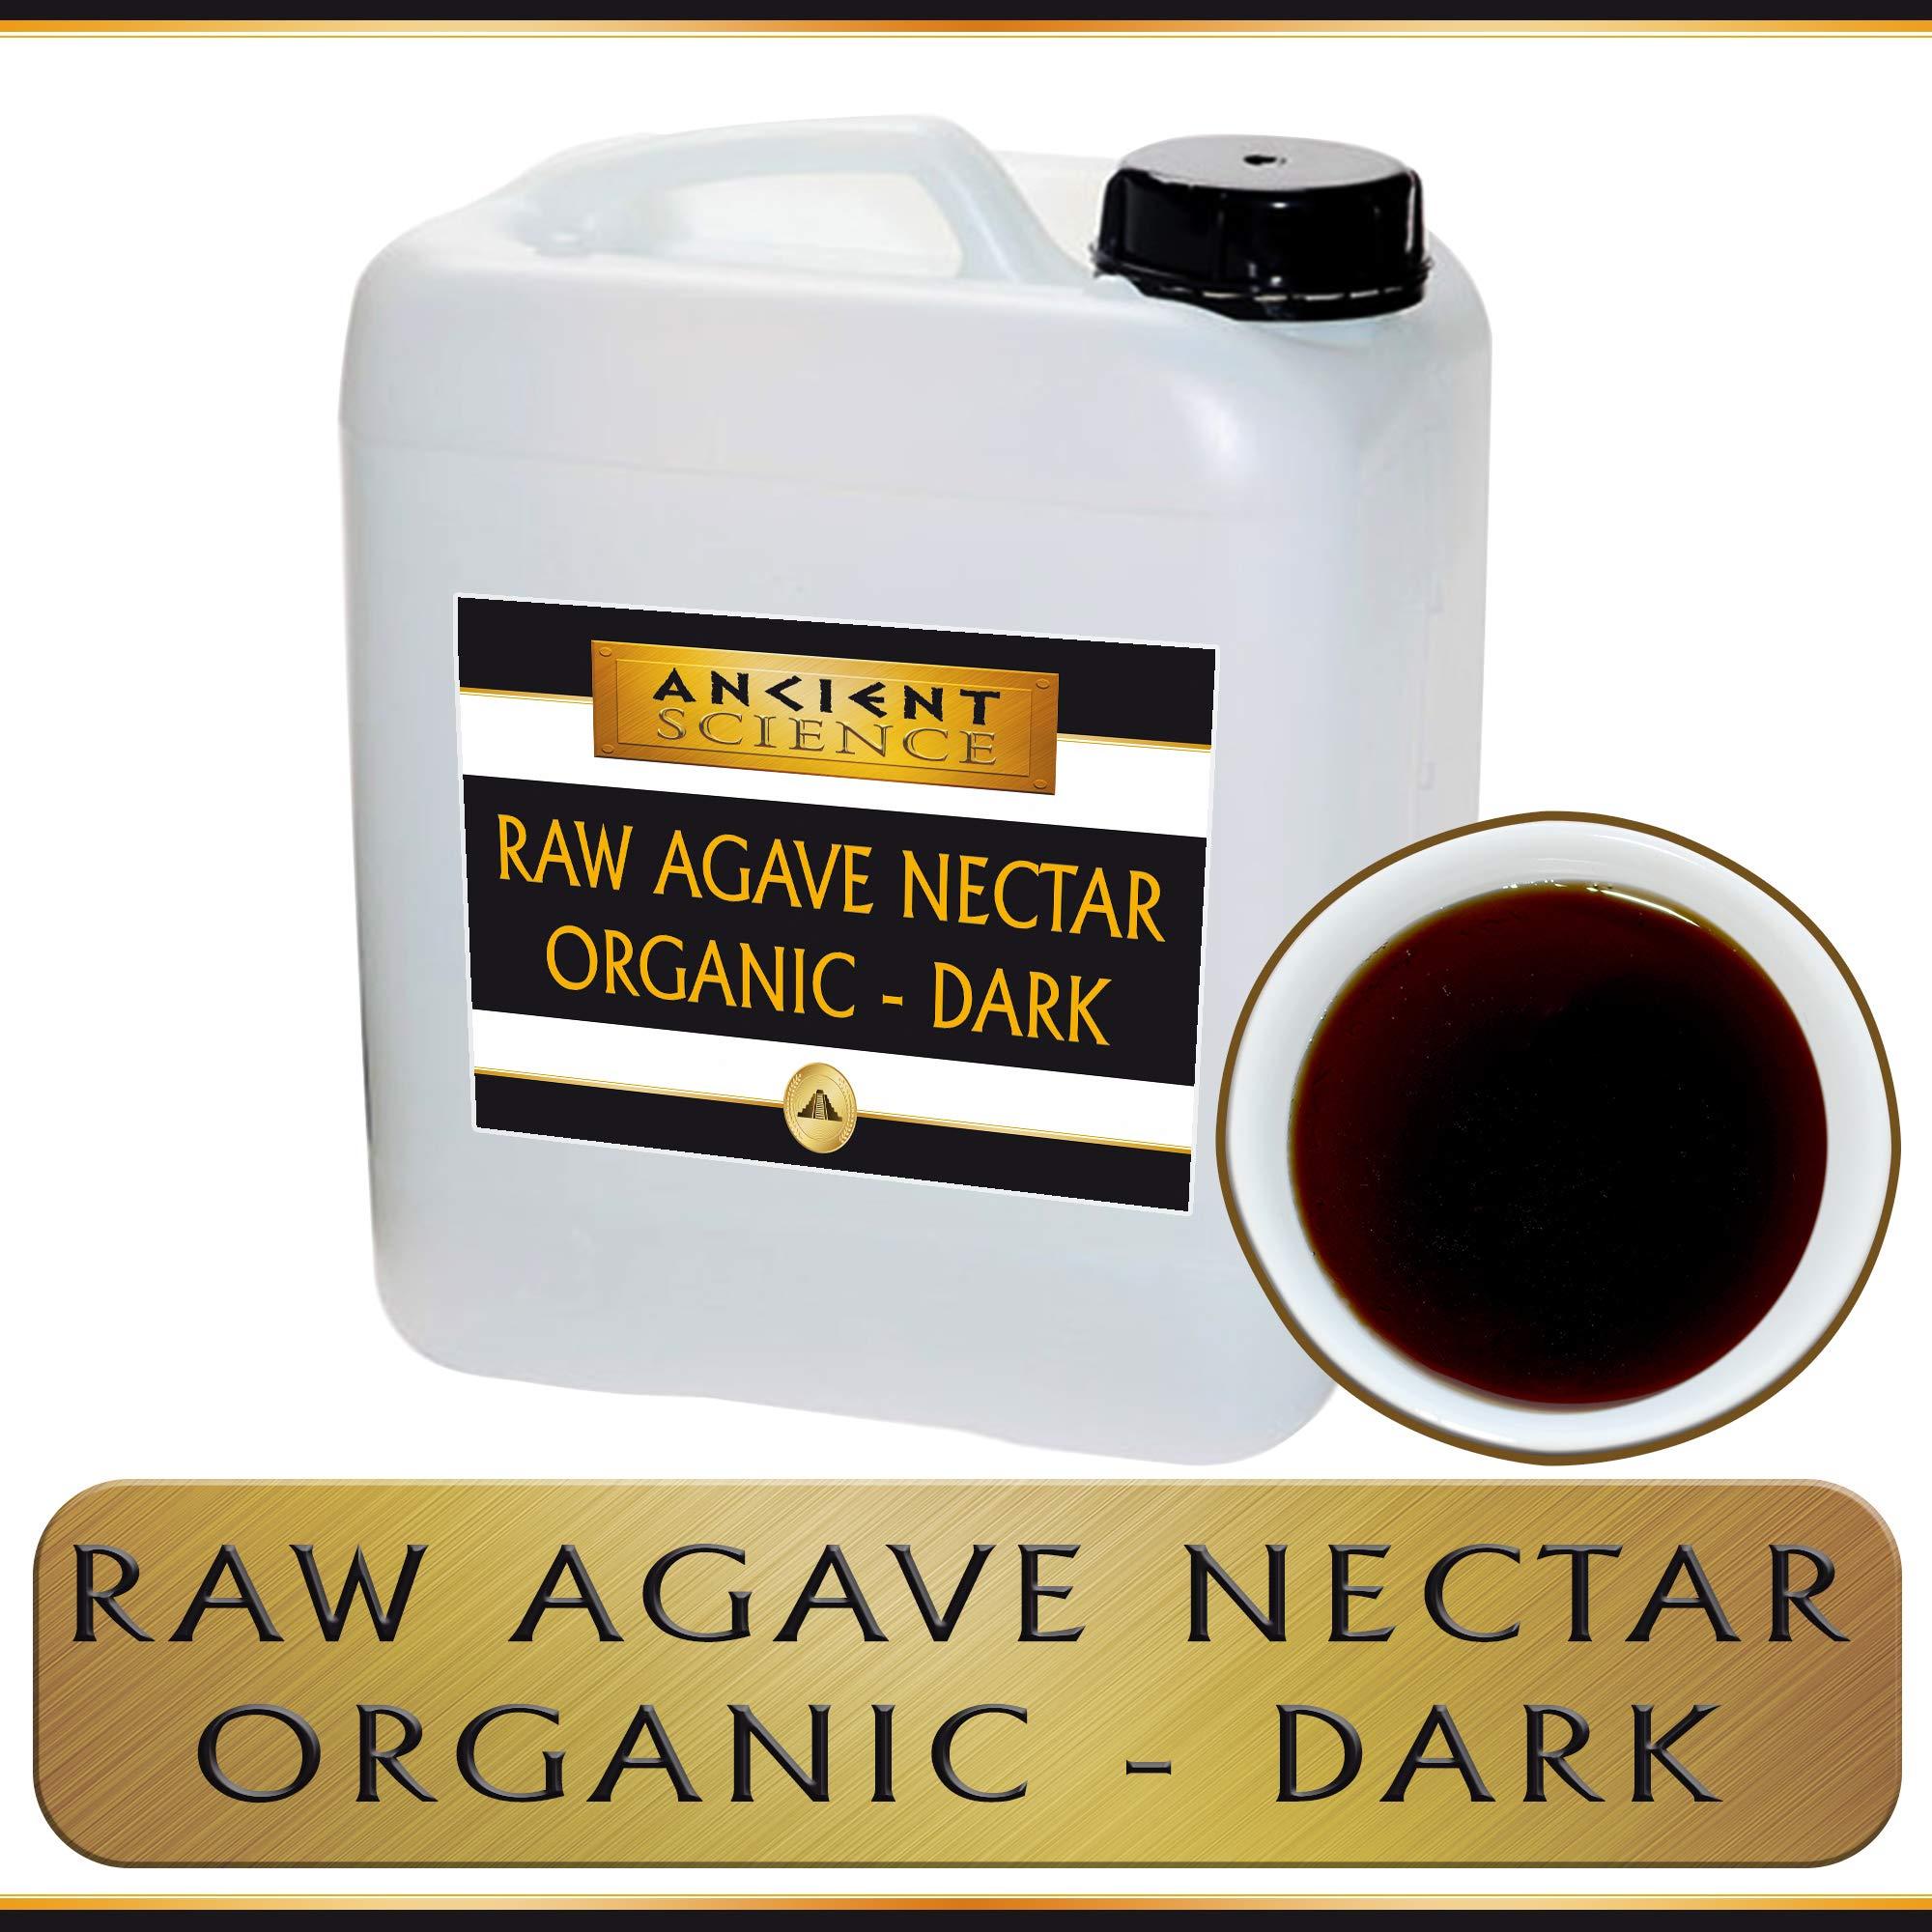 Bulk Raw Agave Nectar Organic - DARK - 5 Gallon Wholesale Supplier - Kosher